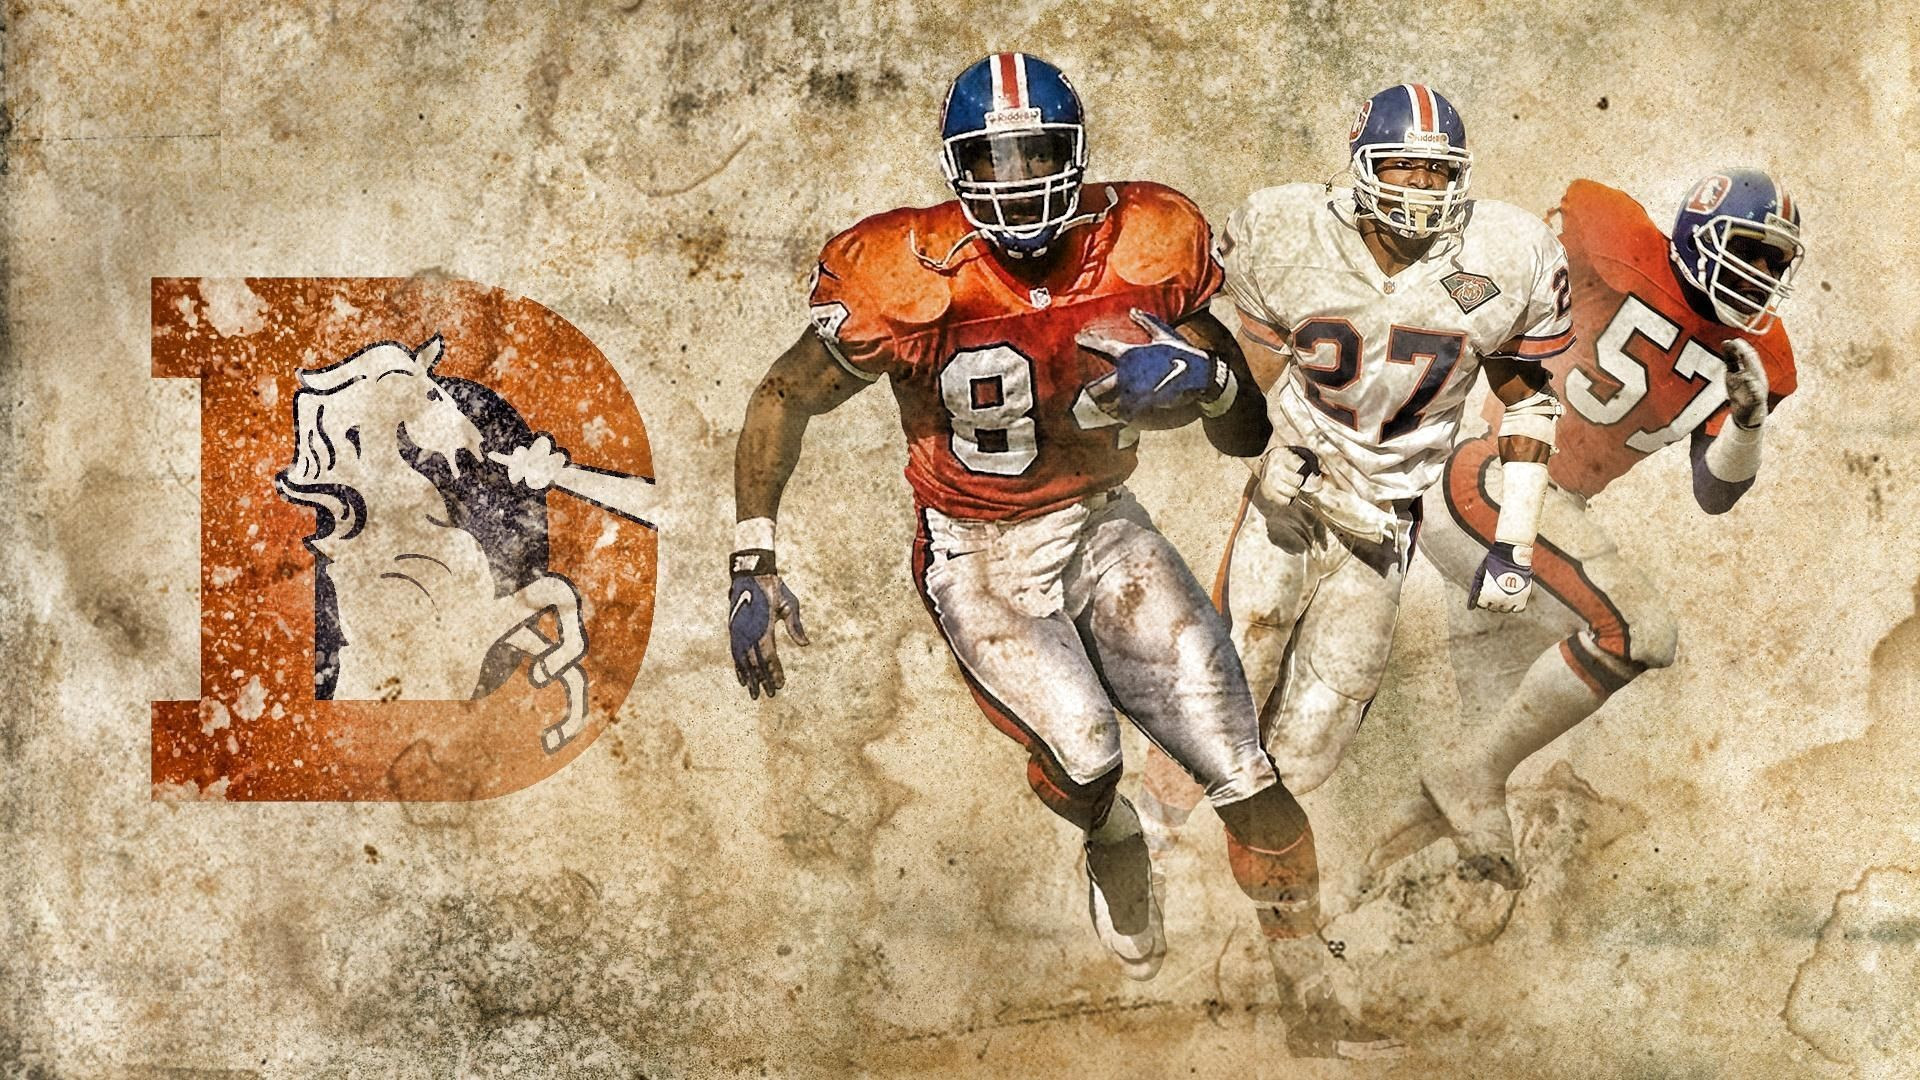 Denver Broncos Mac Backgrounds   2019 NFL Football Wallpapers